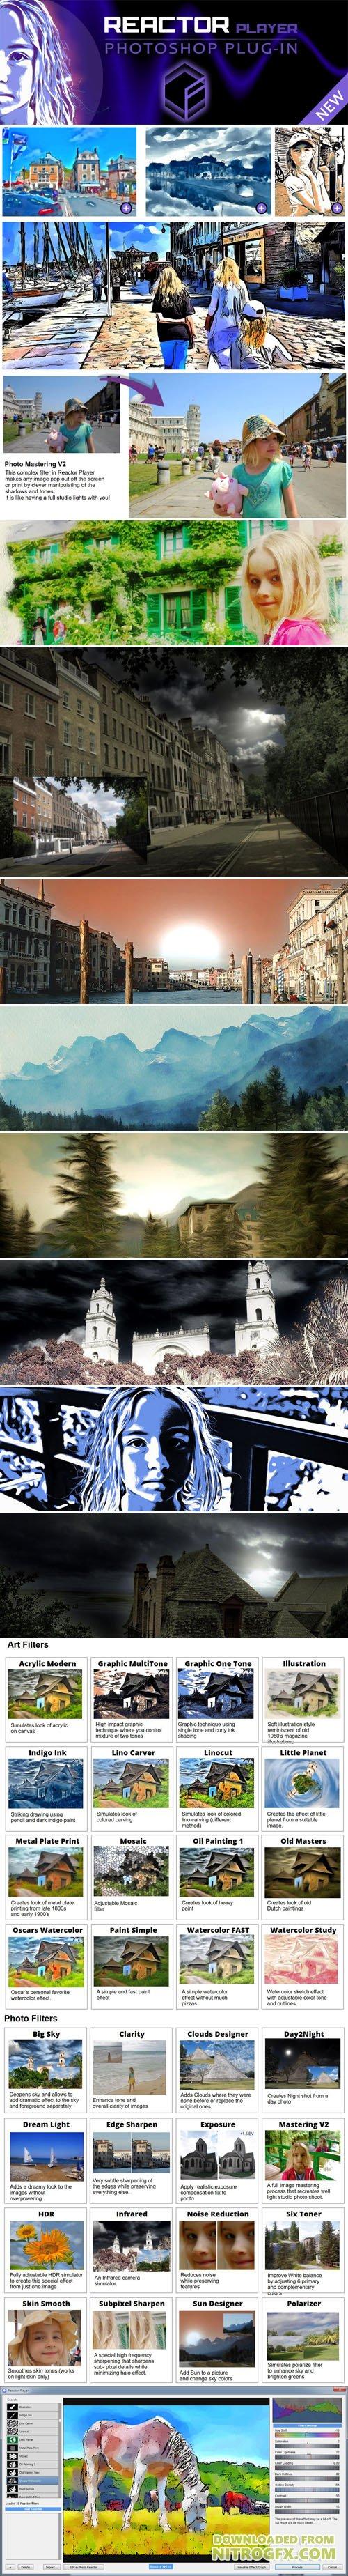 Photoshop » NitroGFX - Download Unique Graphics For Creative